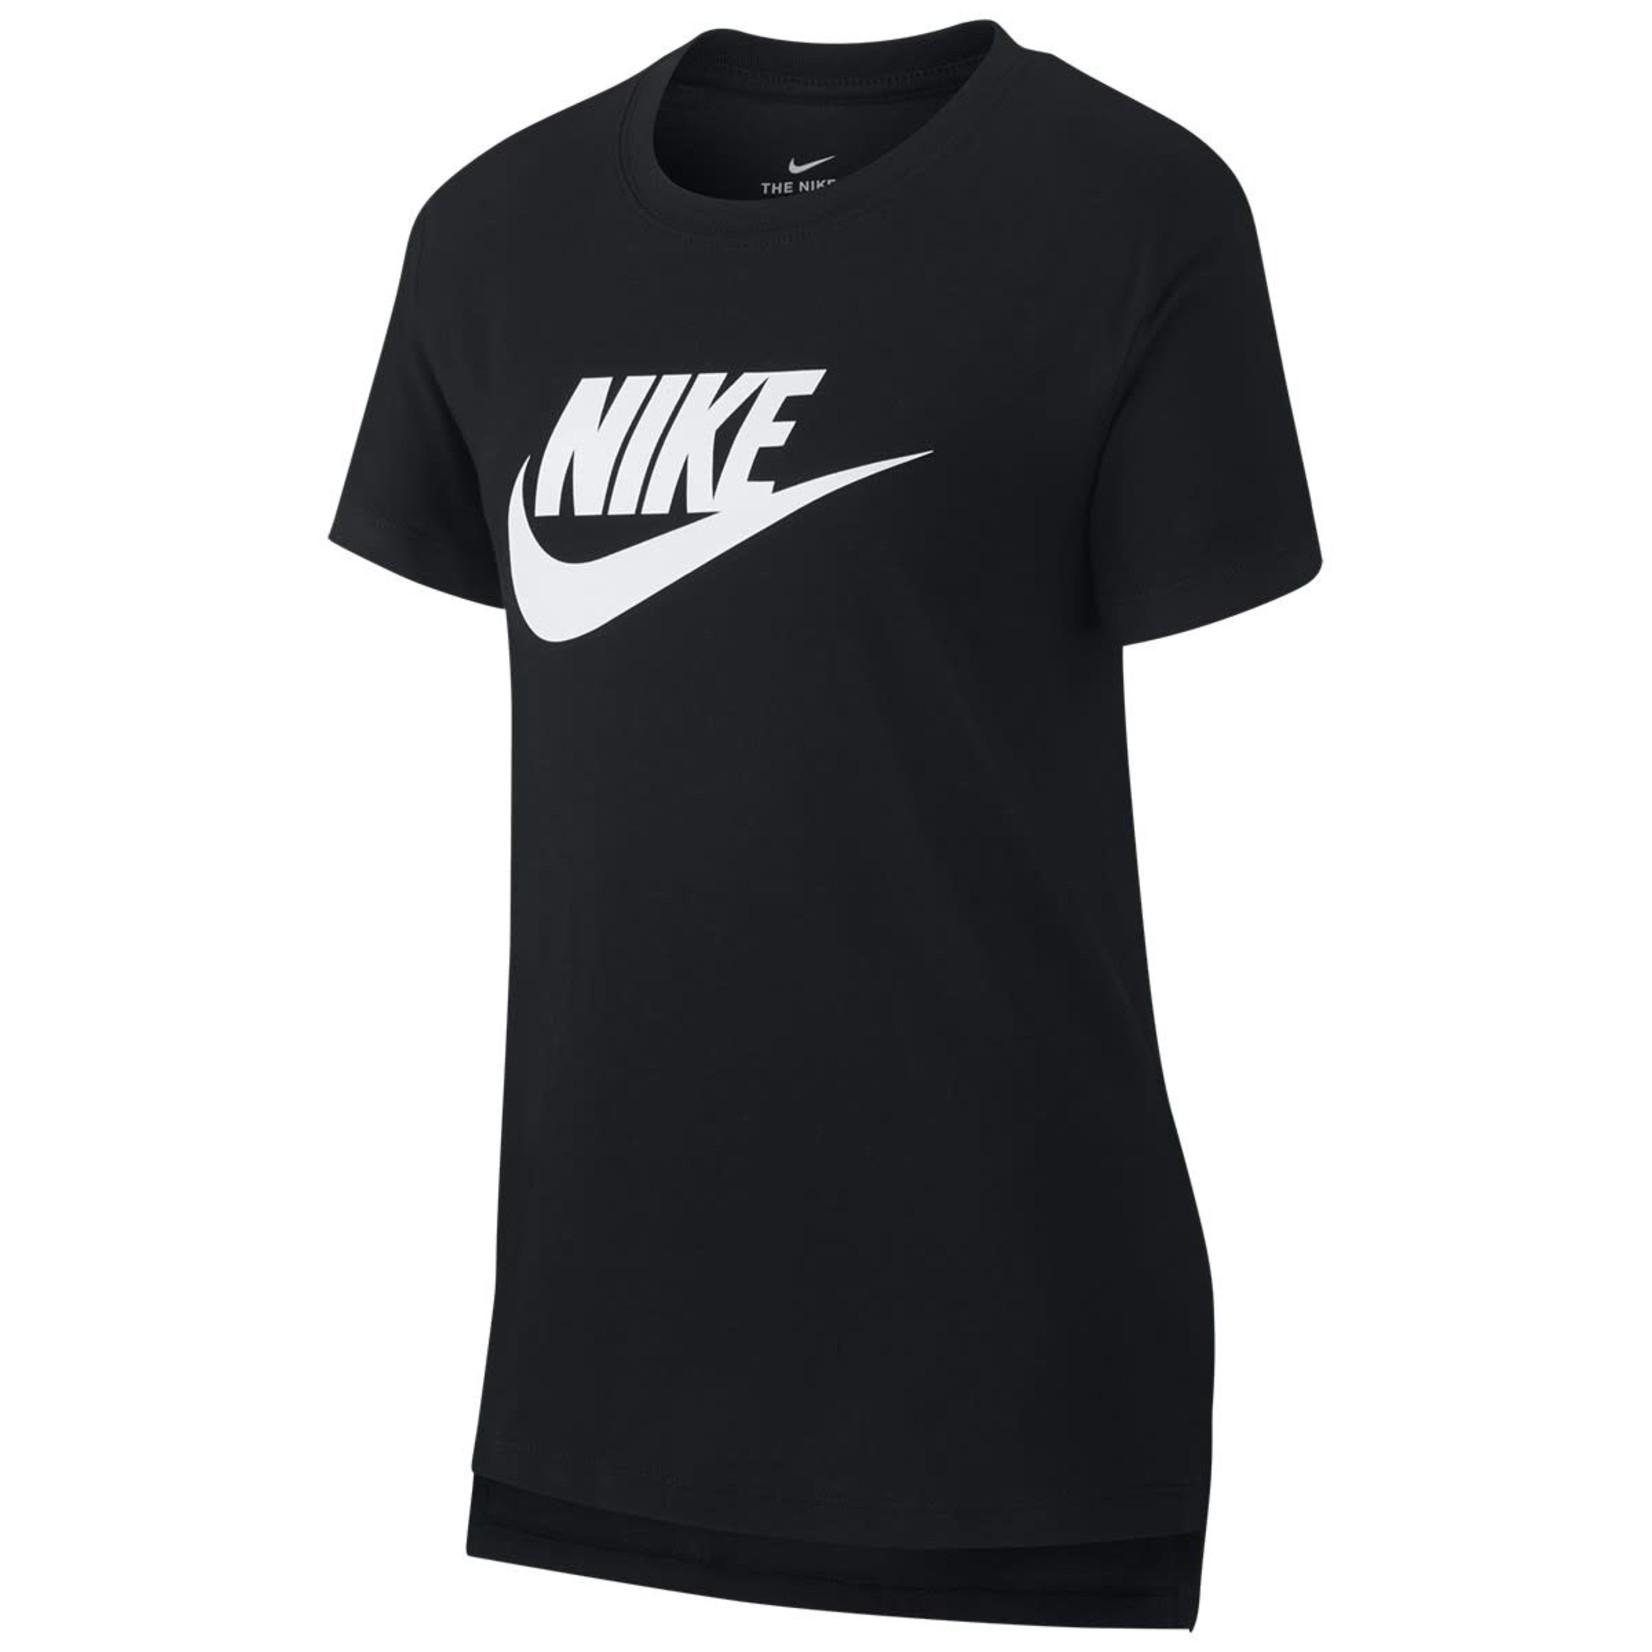 Nike Nike T-Shirt, Sportswear, Girls